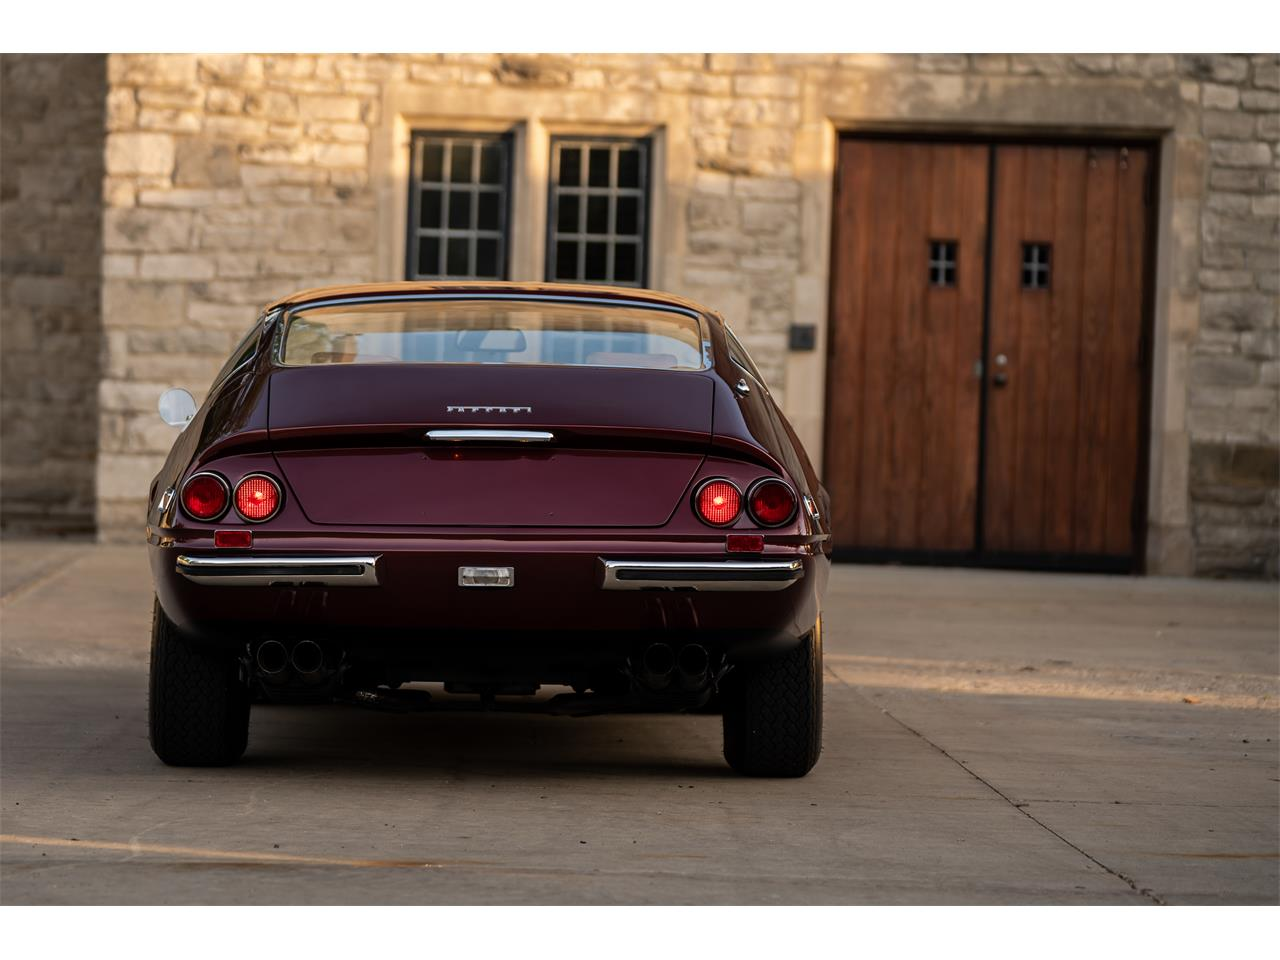 Large Picture of 1972 Ferrari 365 GTB/4 Daytona located in Michigan - $725,000.00 - QL32